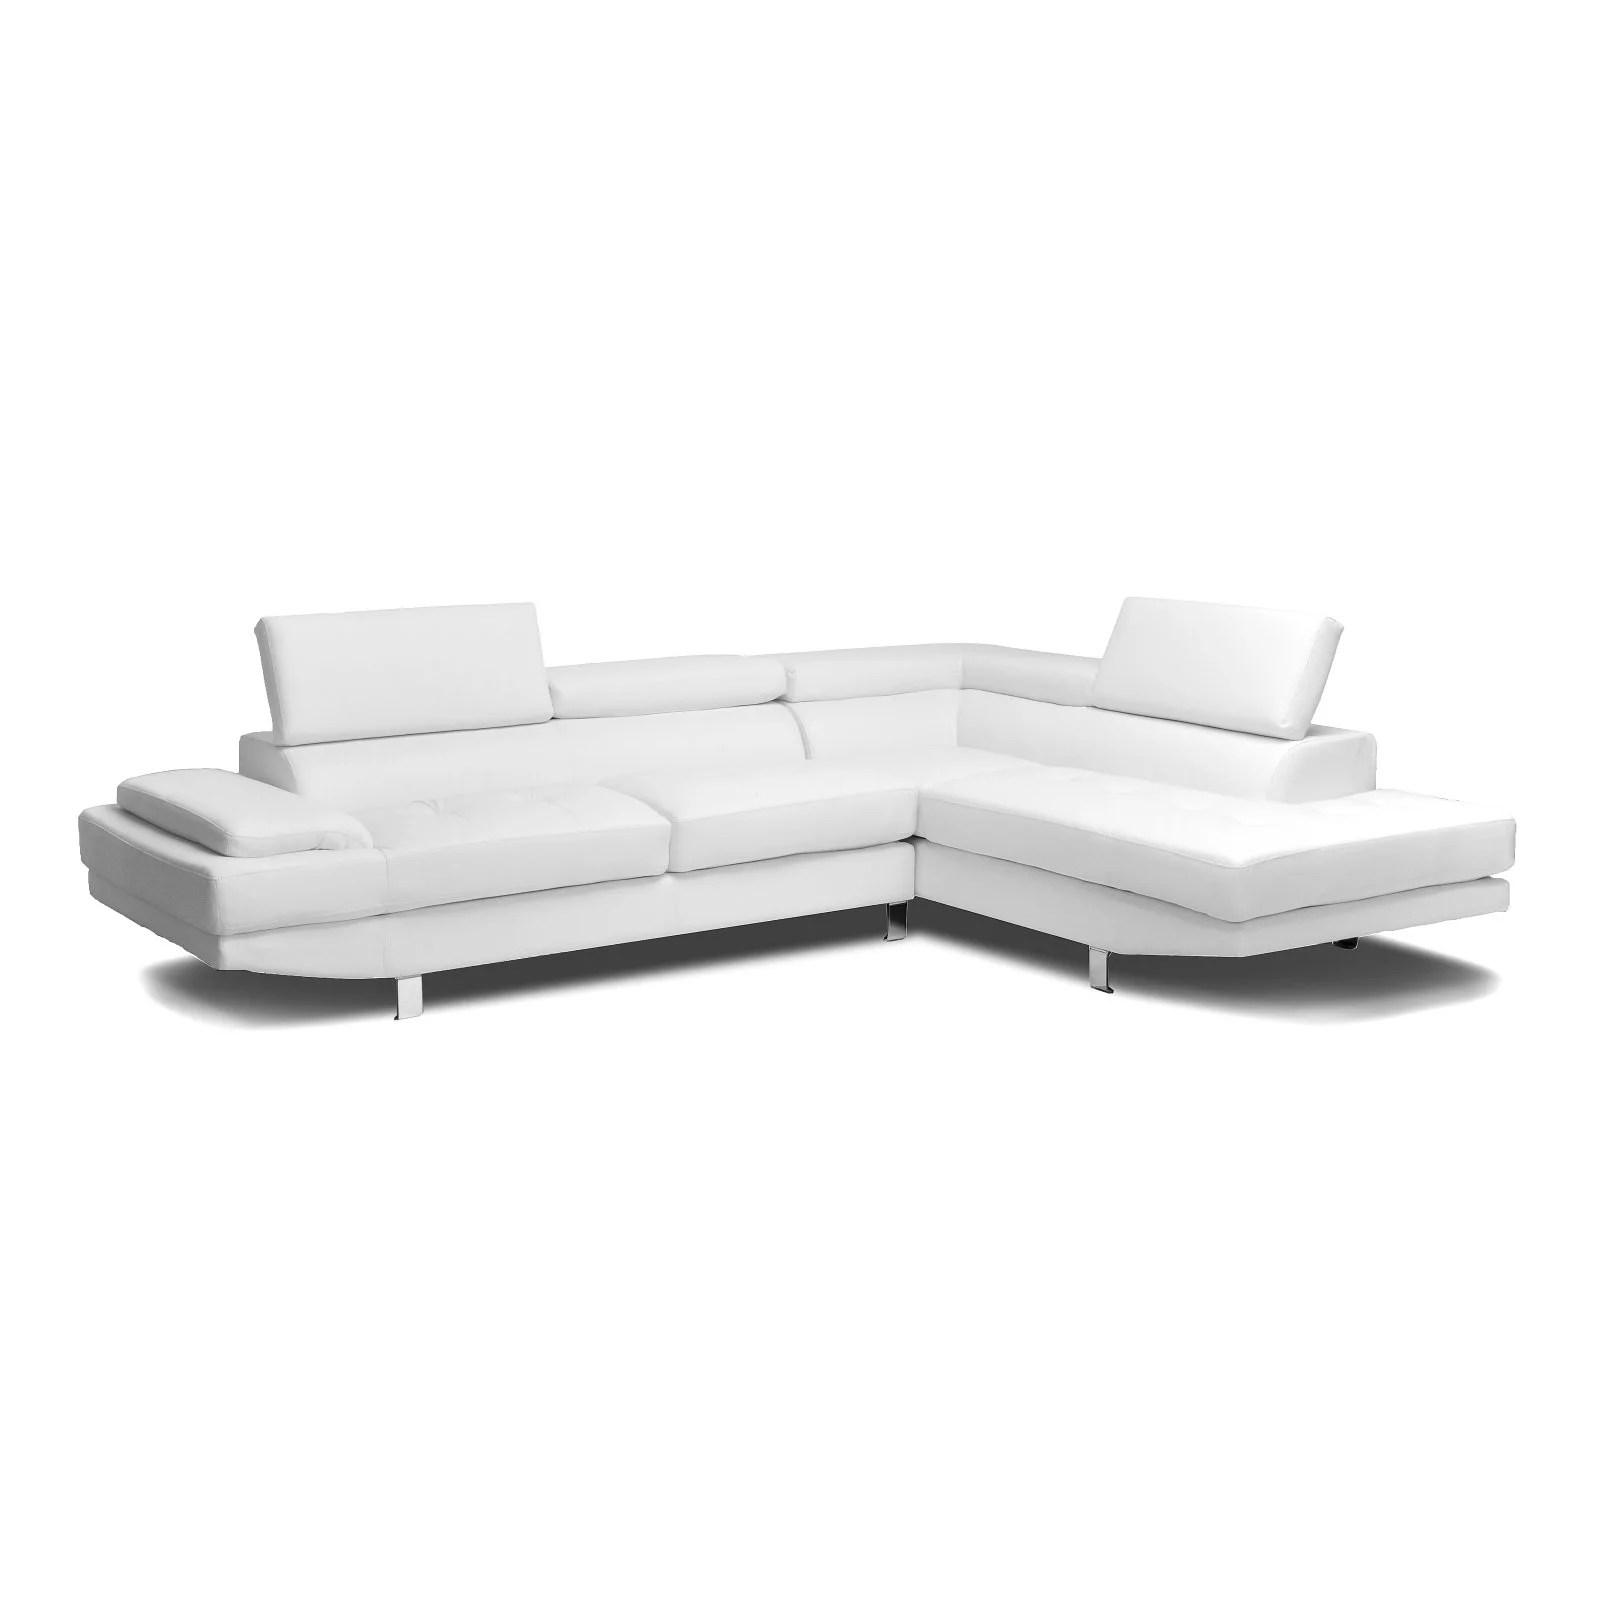 selma white leather modern sectional sofa